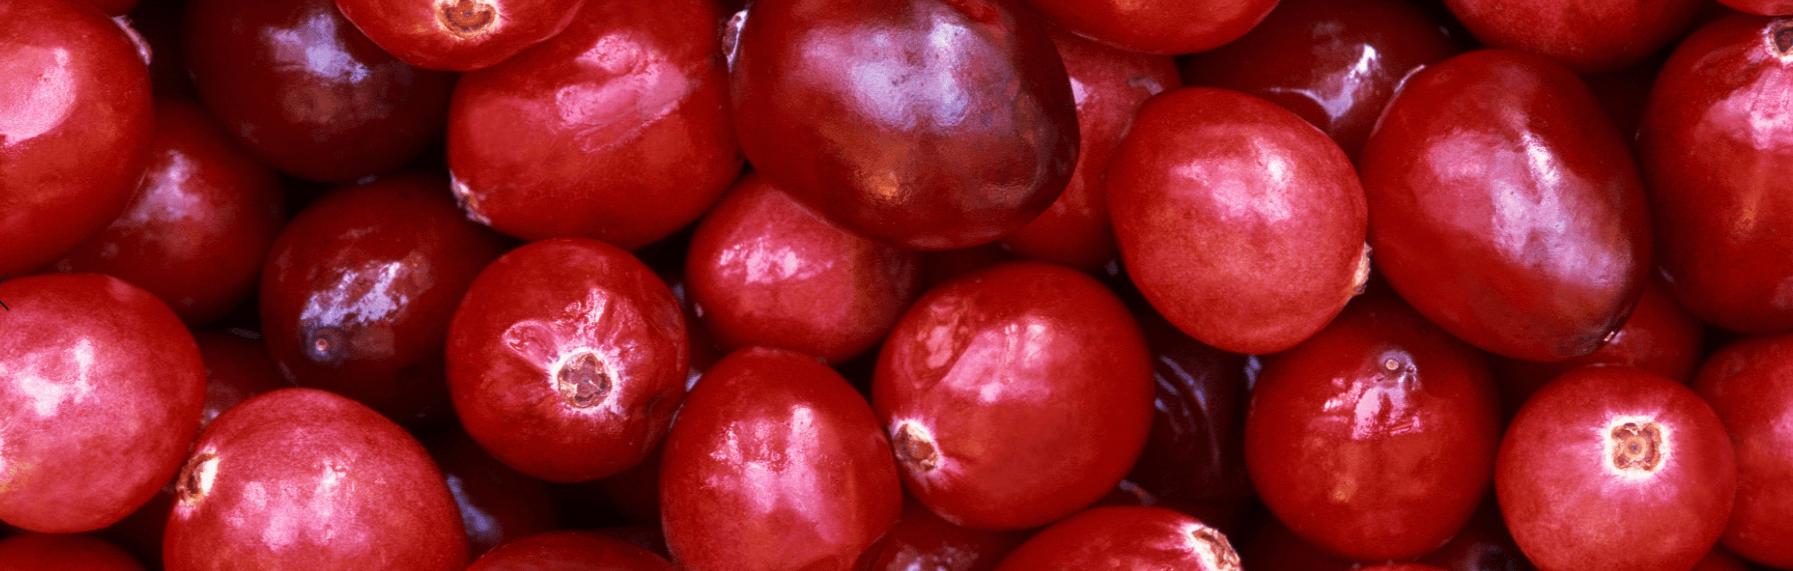 Pile of cranberries.